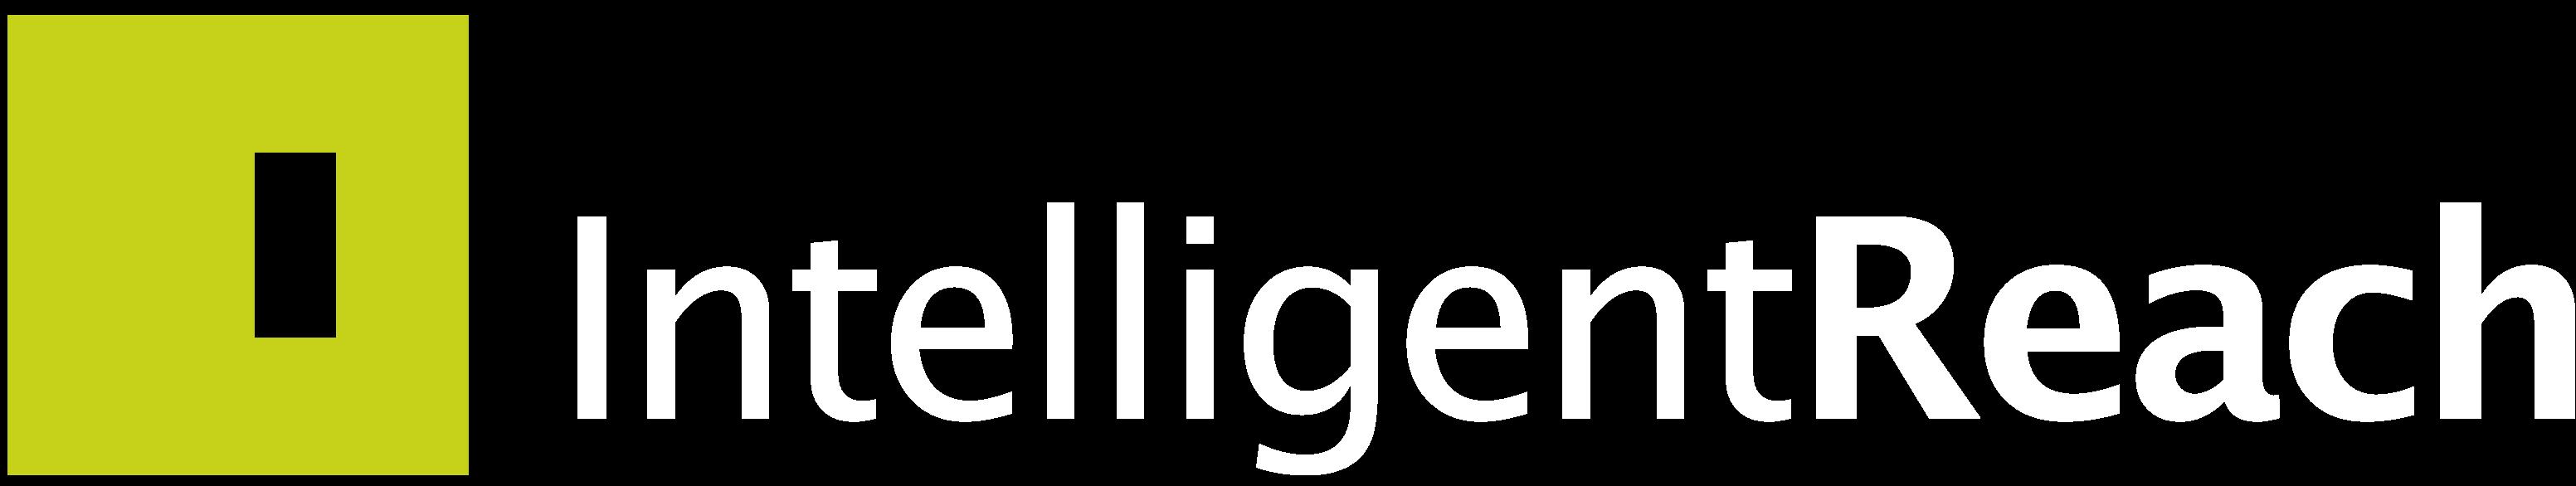 IntelligentReach_logo.png